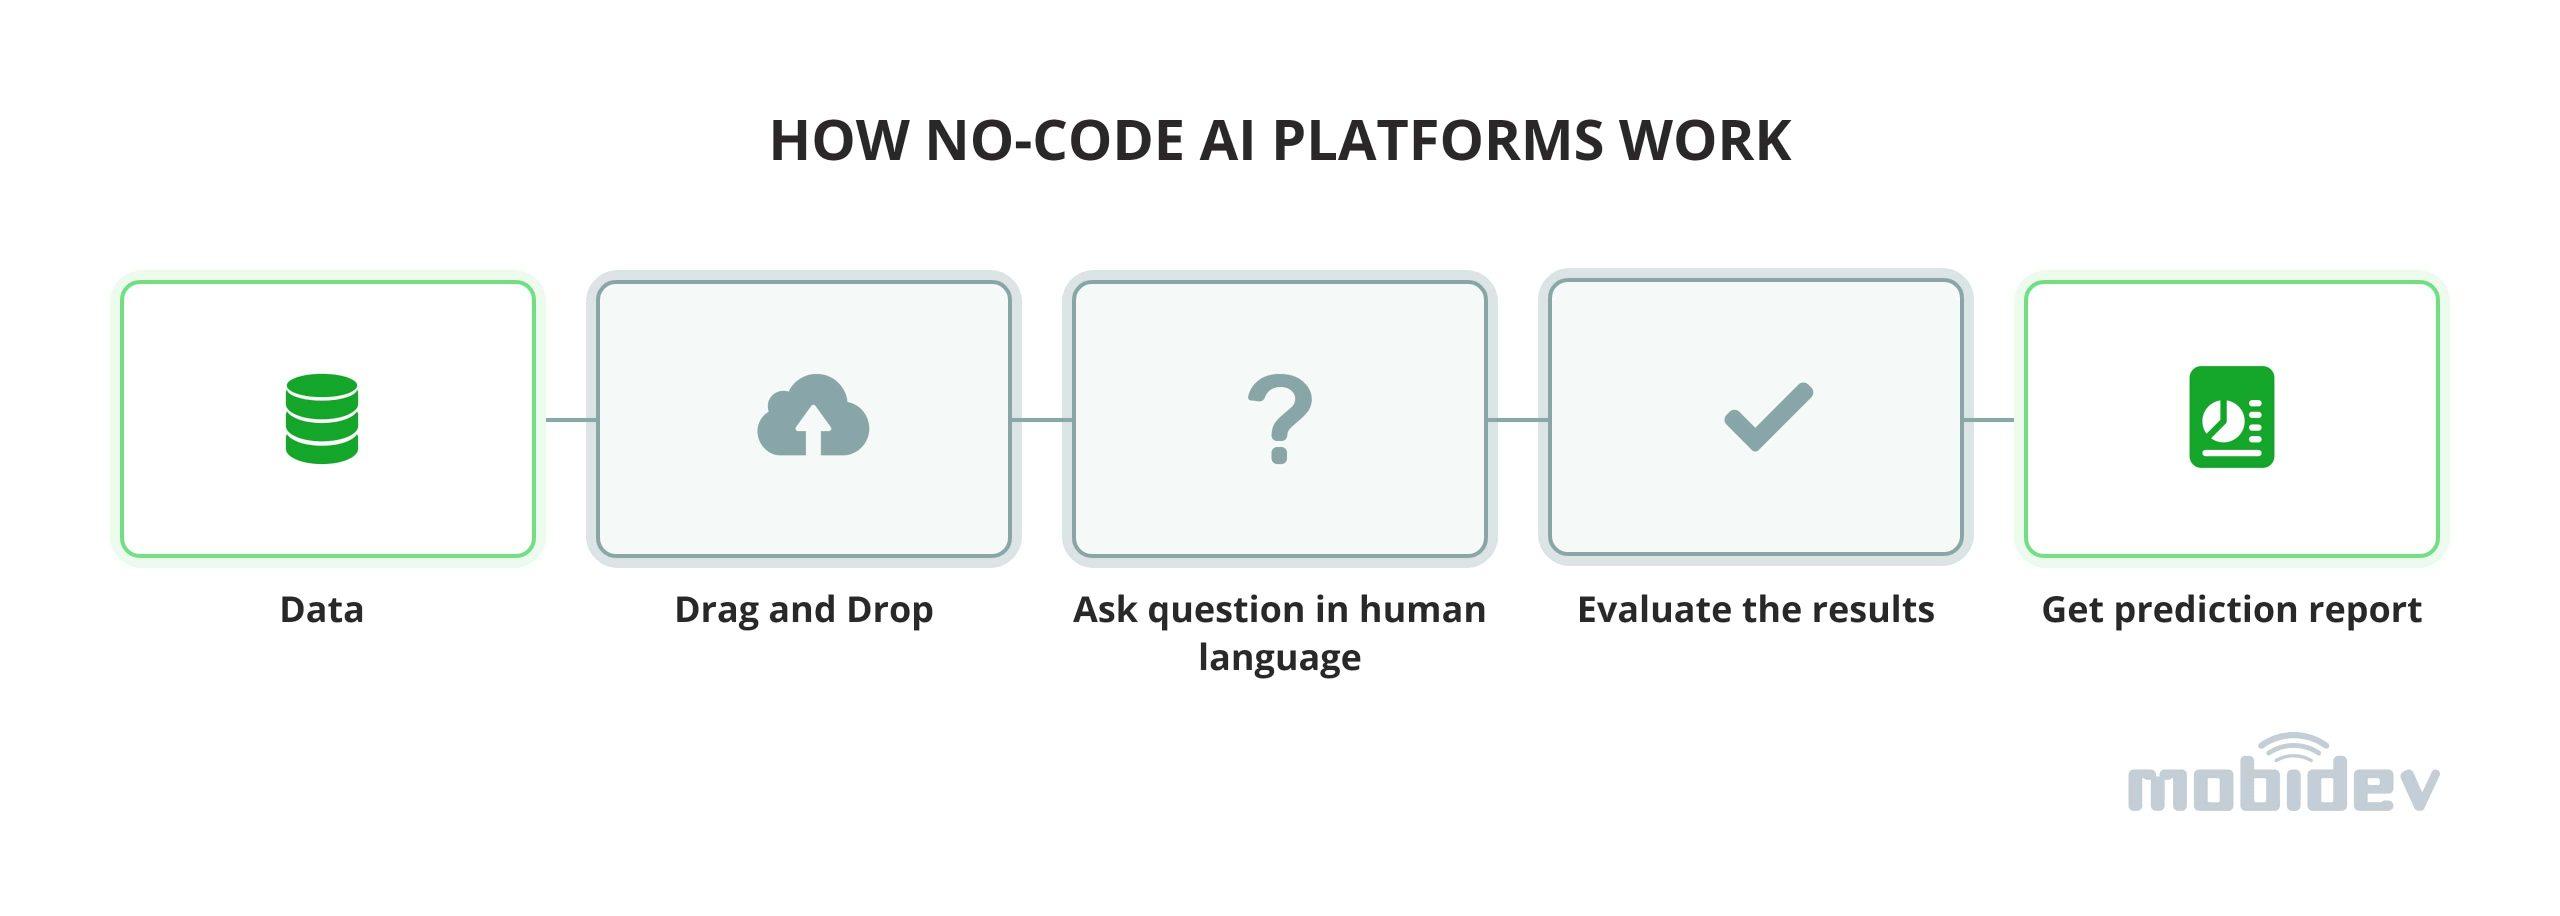 No-Code Machine Learning